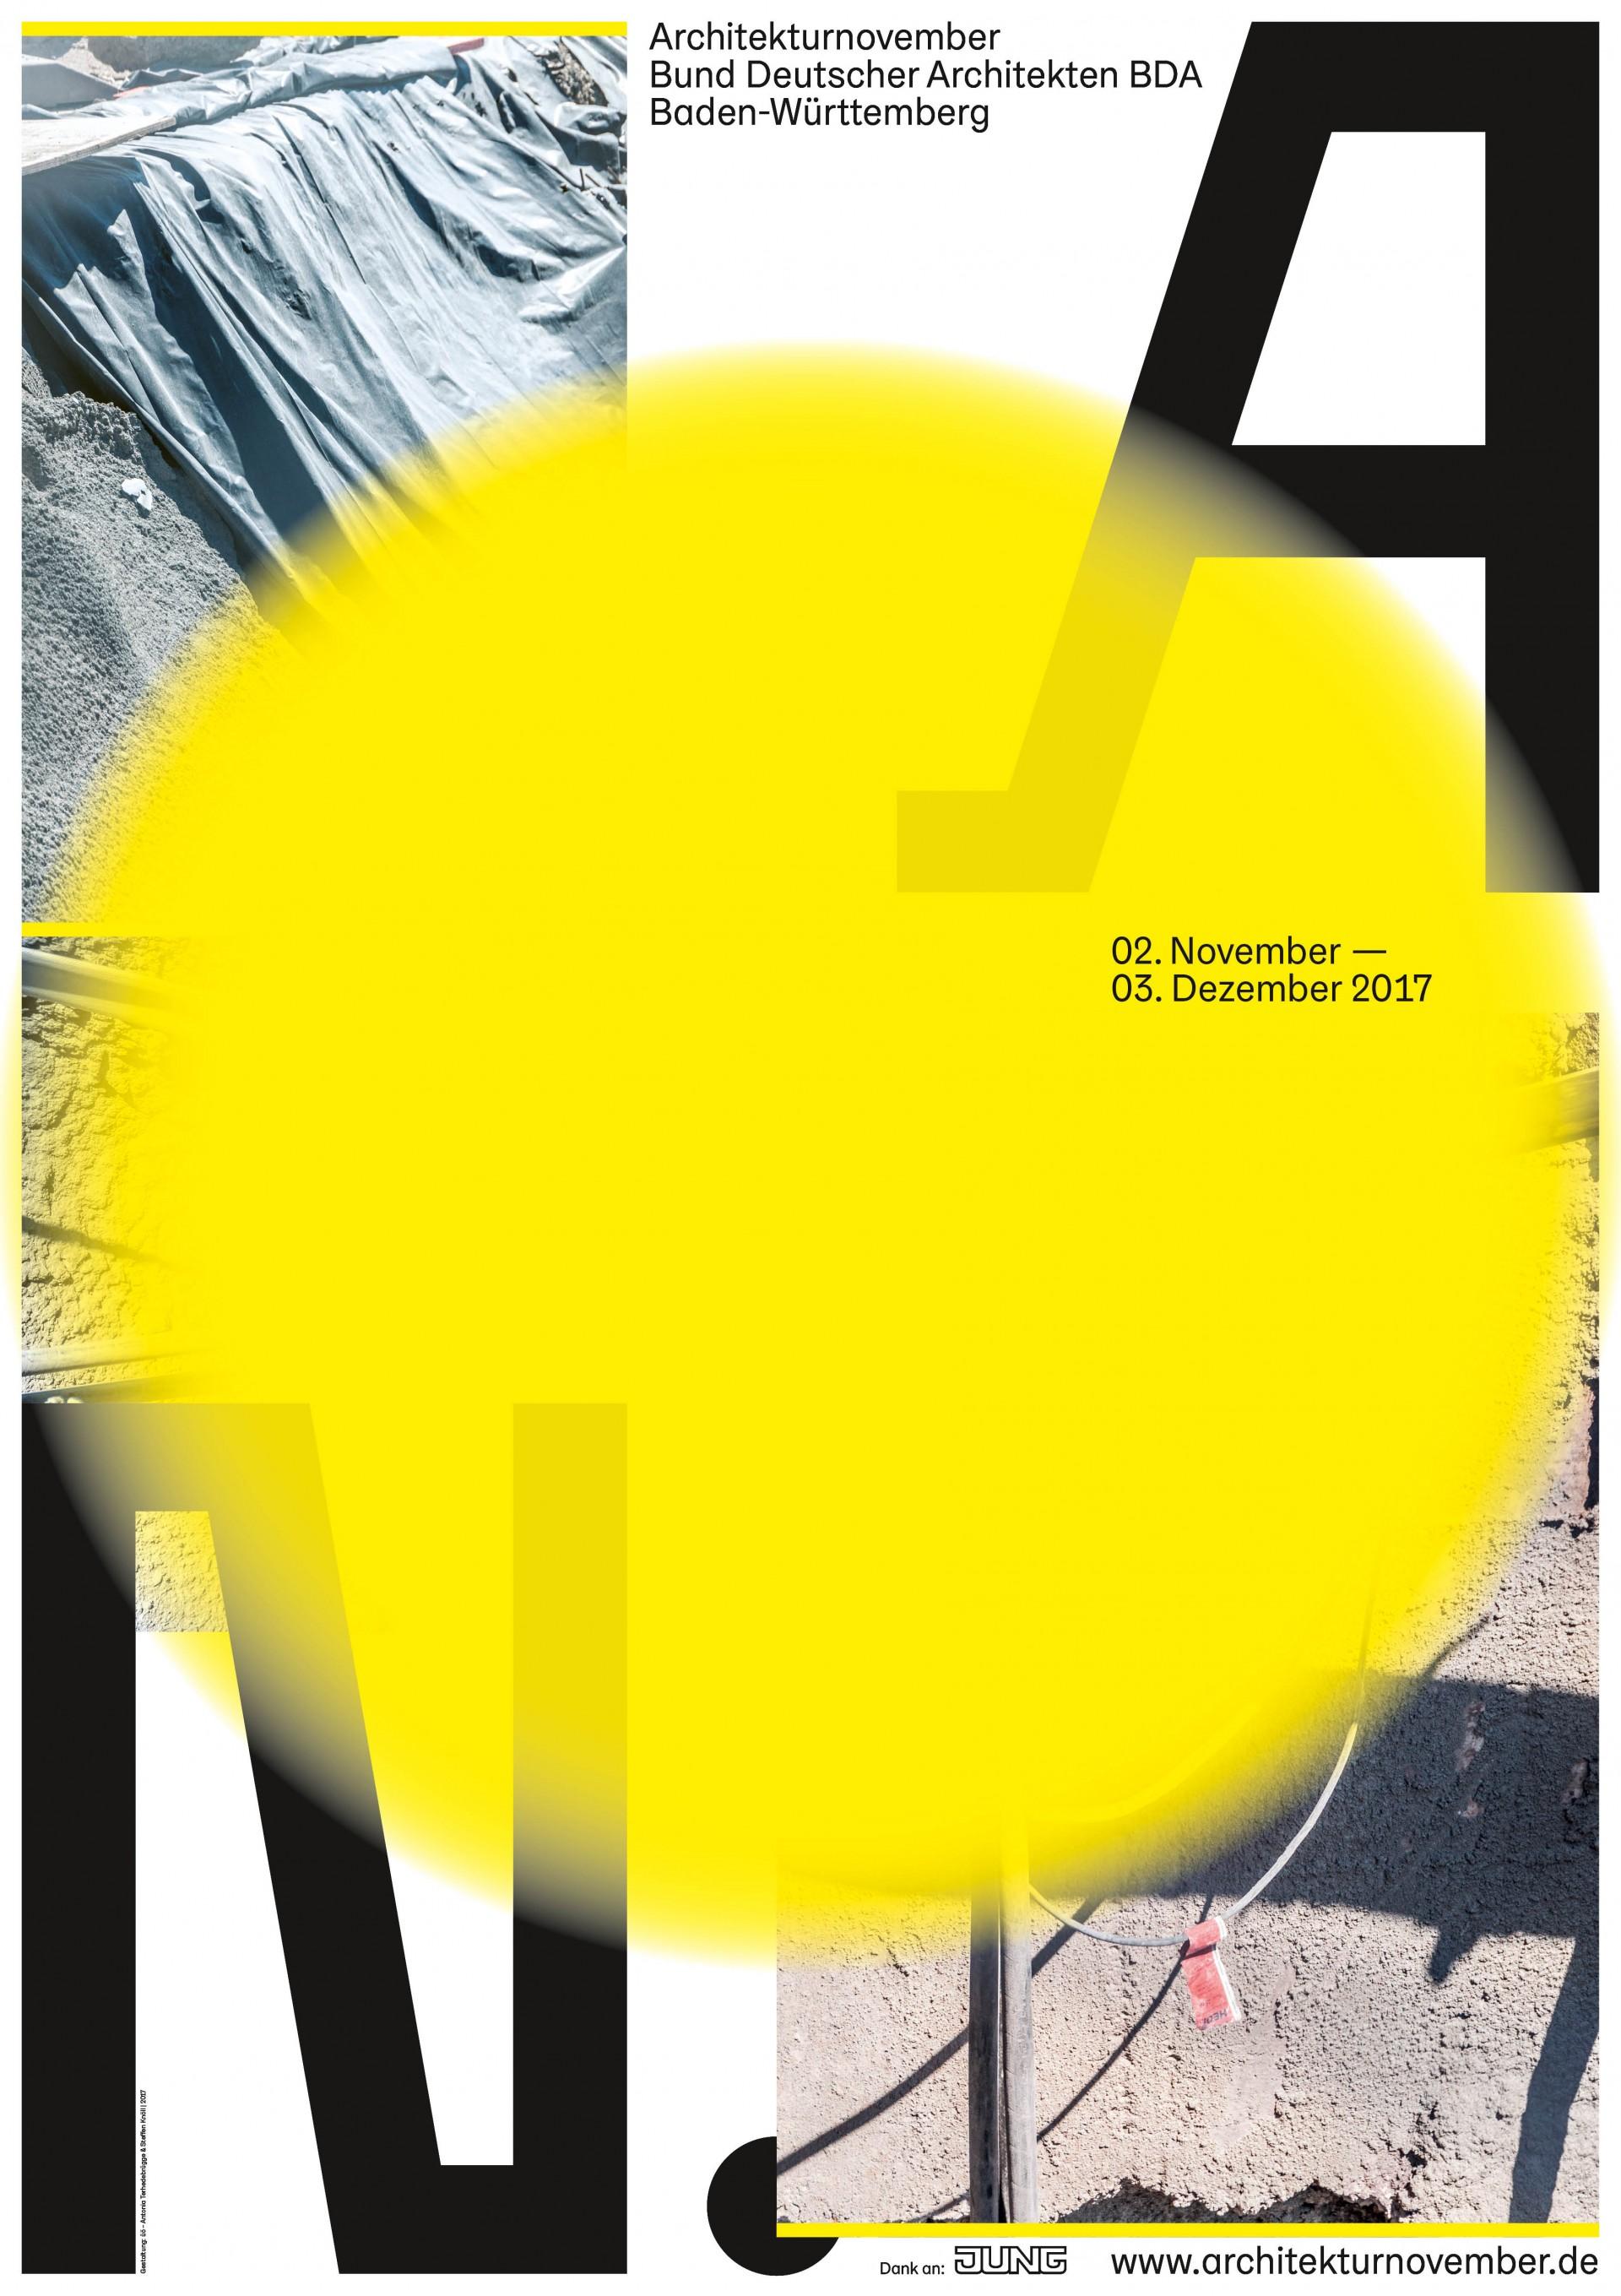 Terhedebrügge Terhedebrügge Architekturnovember 2017